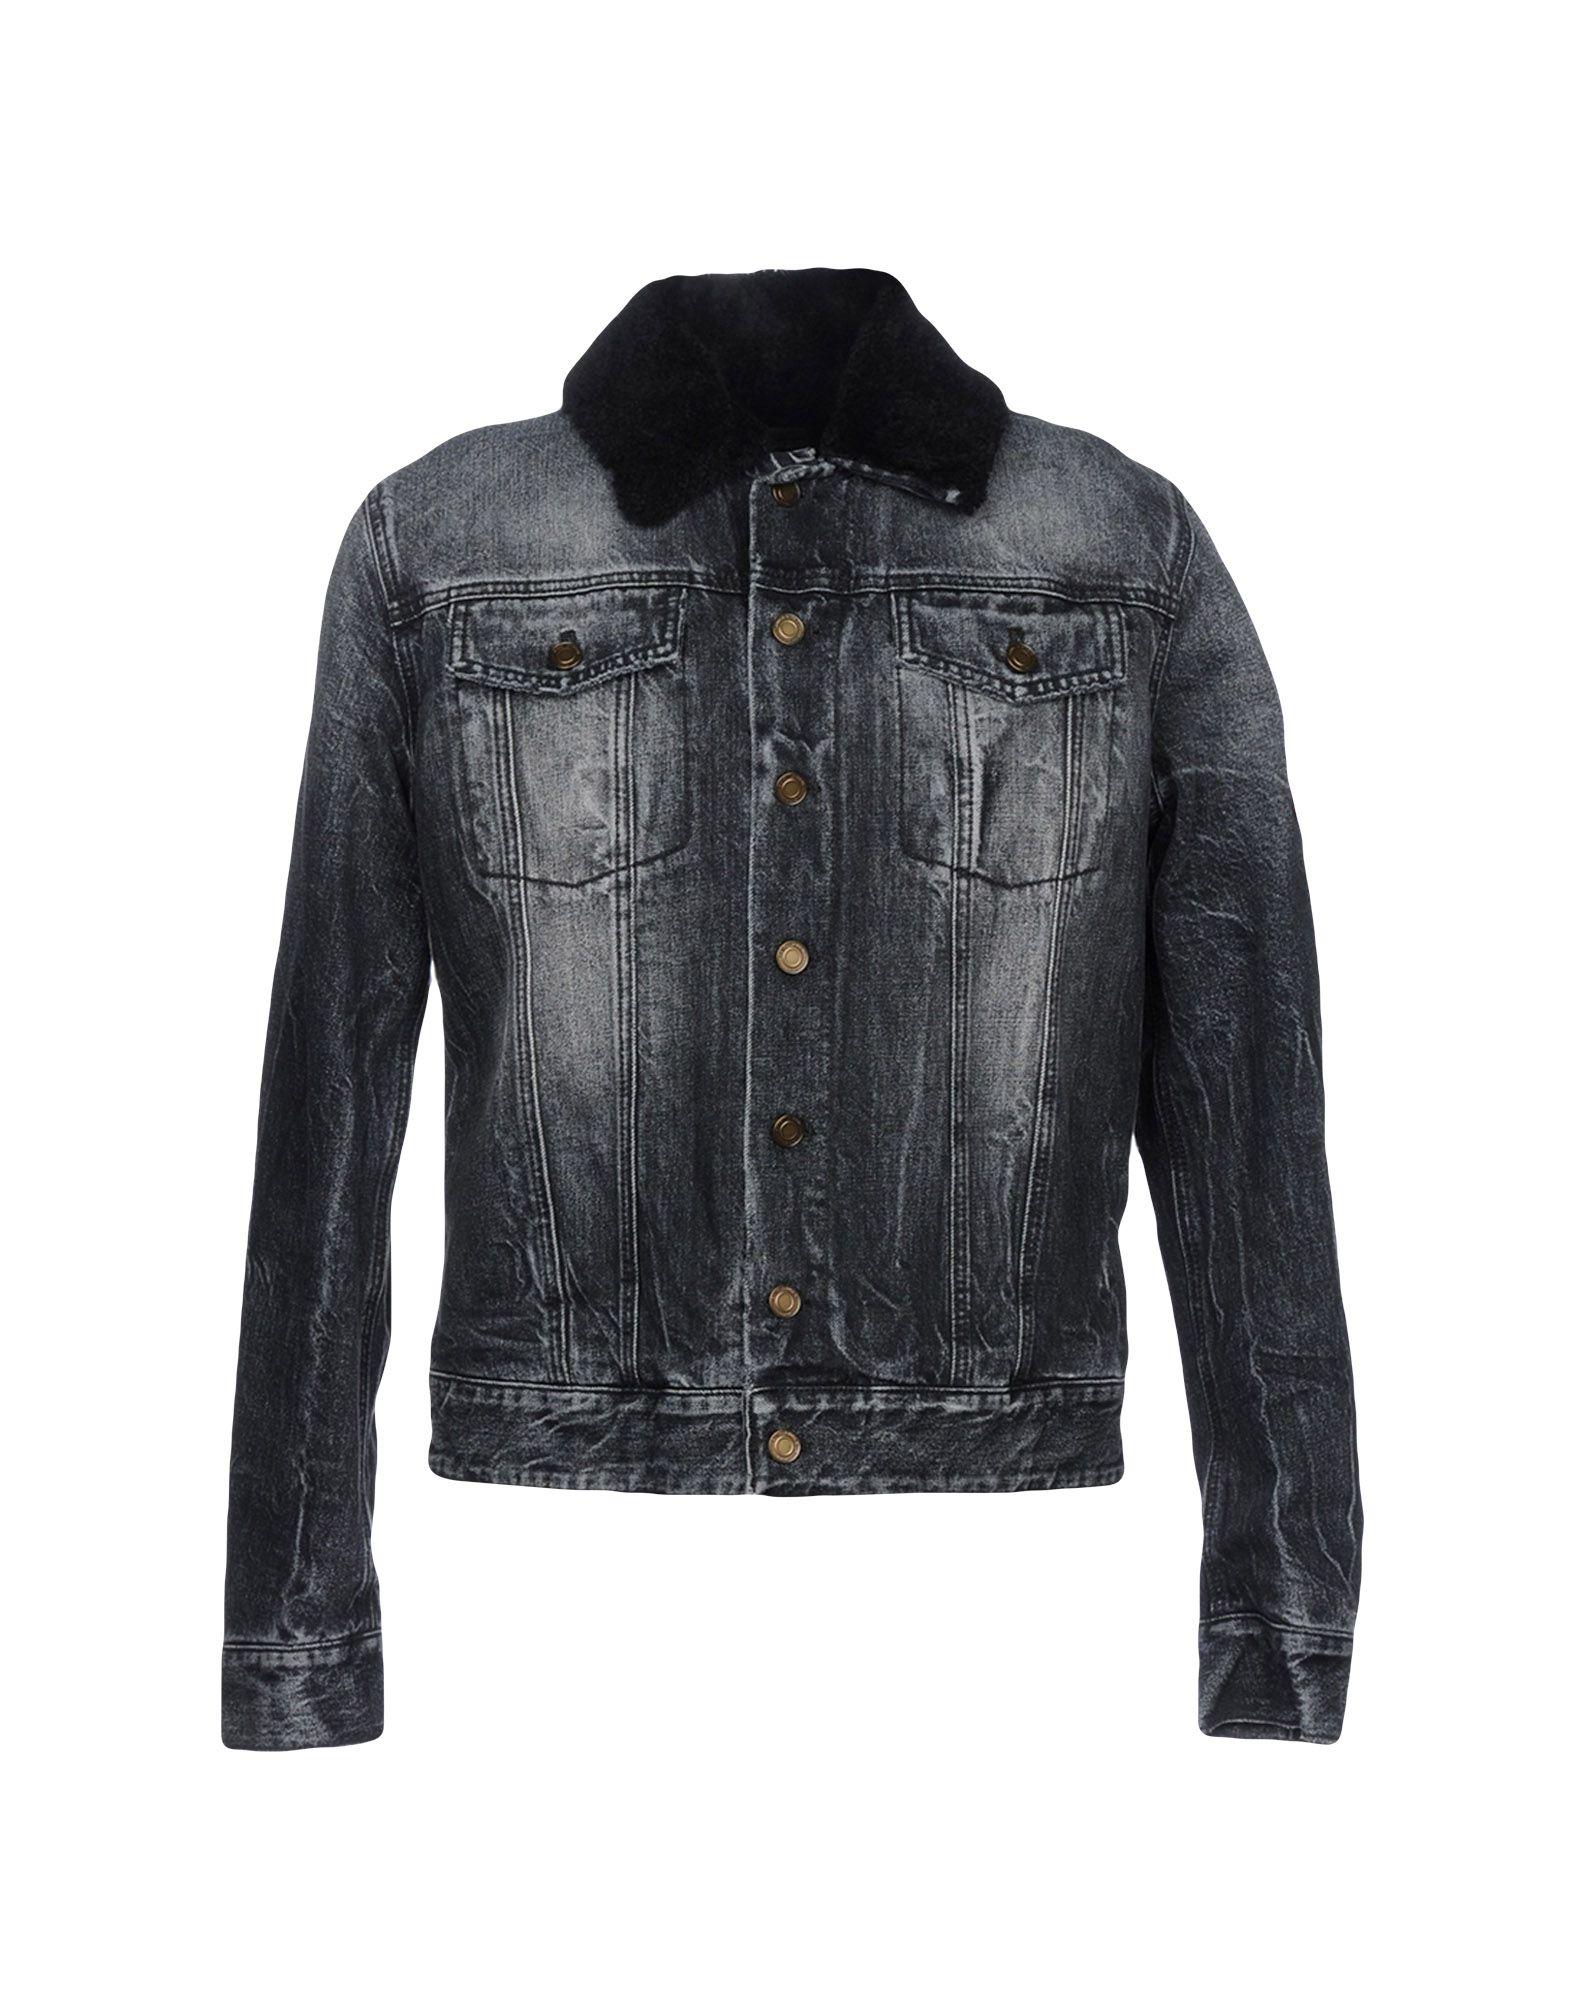 Giubbotto Jeans Saint Laurent Donna - Acquista online su